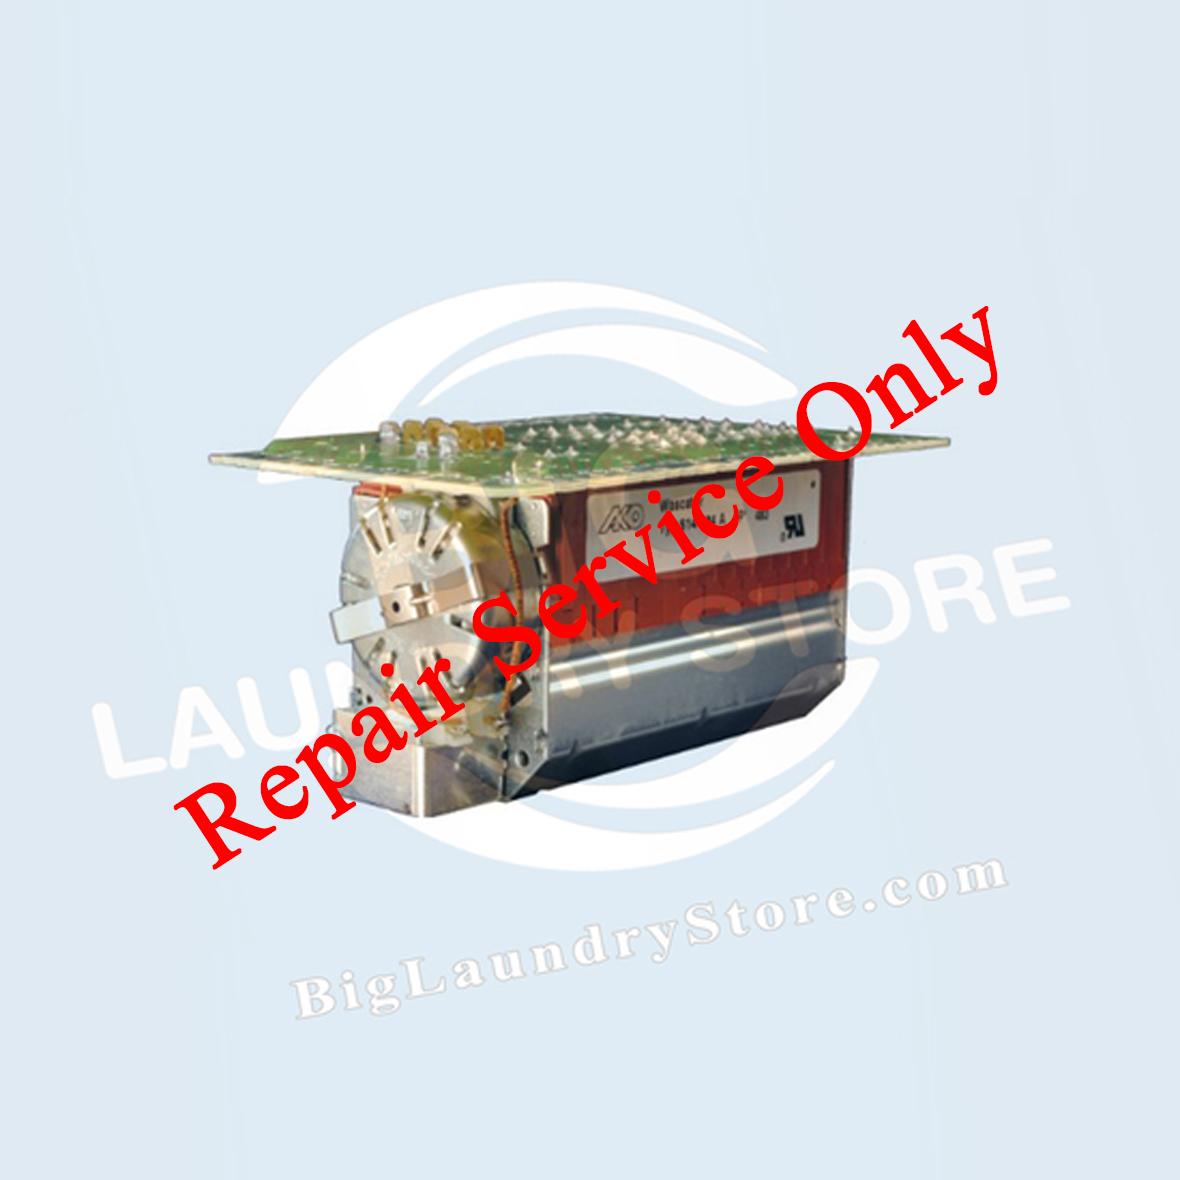 REPAIR - Wascomat Generation 6 110V/60Hz Timer # 898101, 897801 Repair